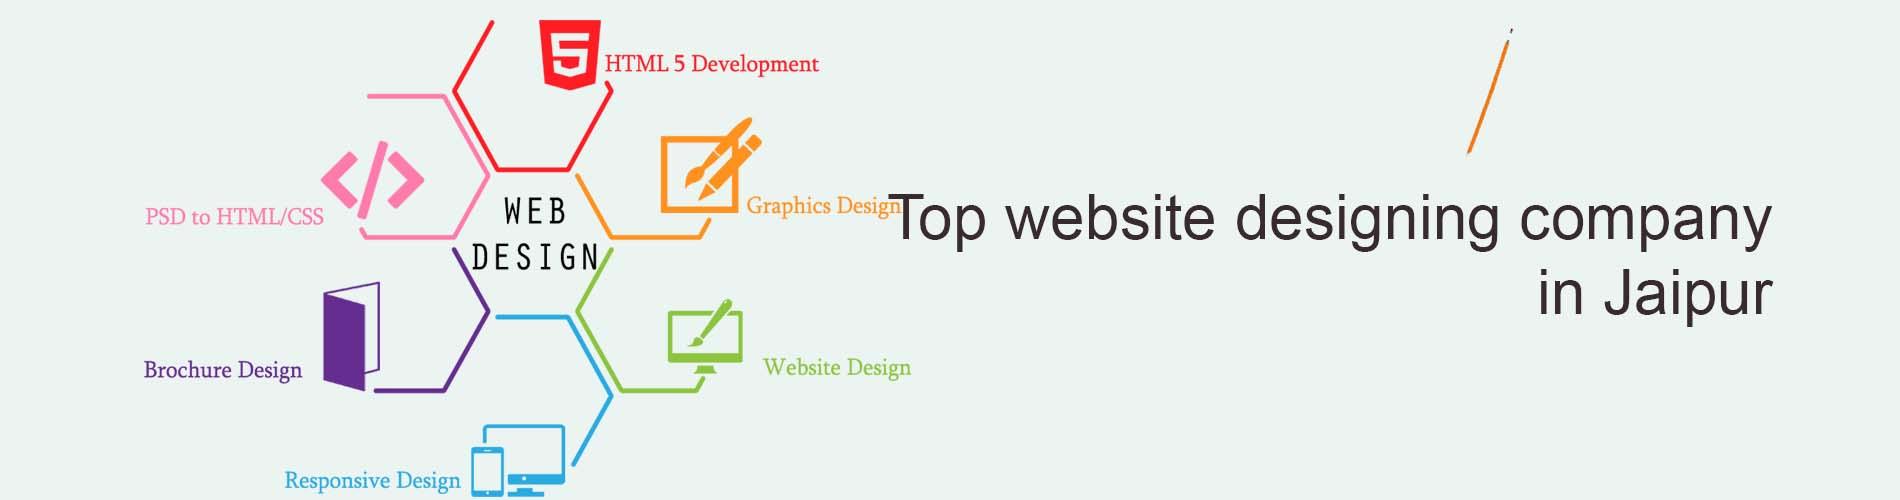 top website designing company in jaipur